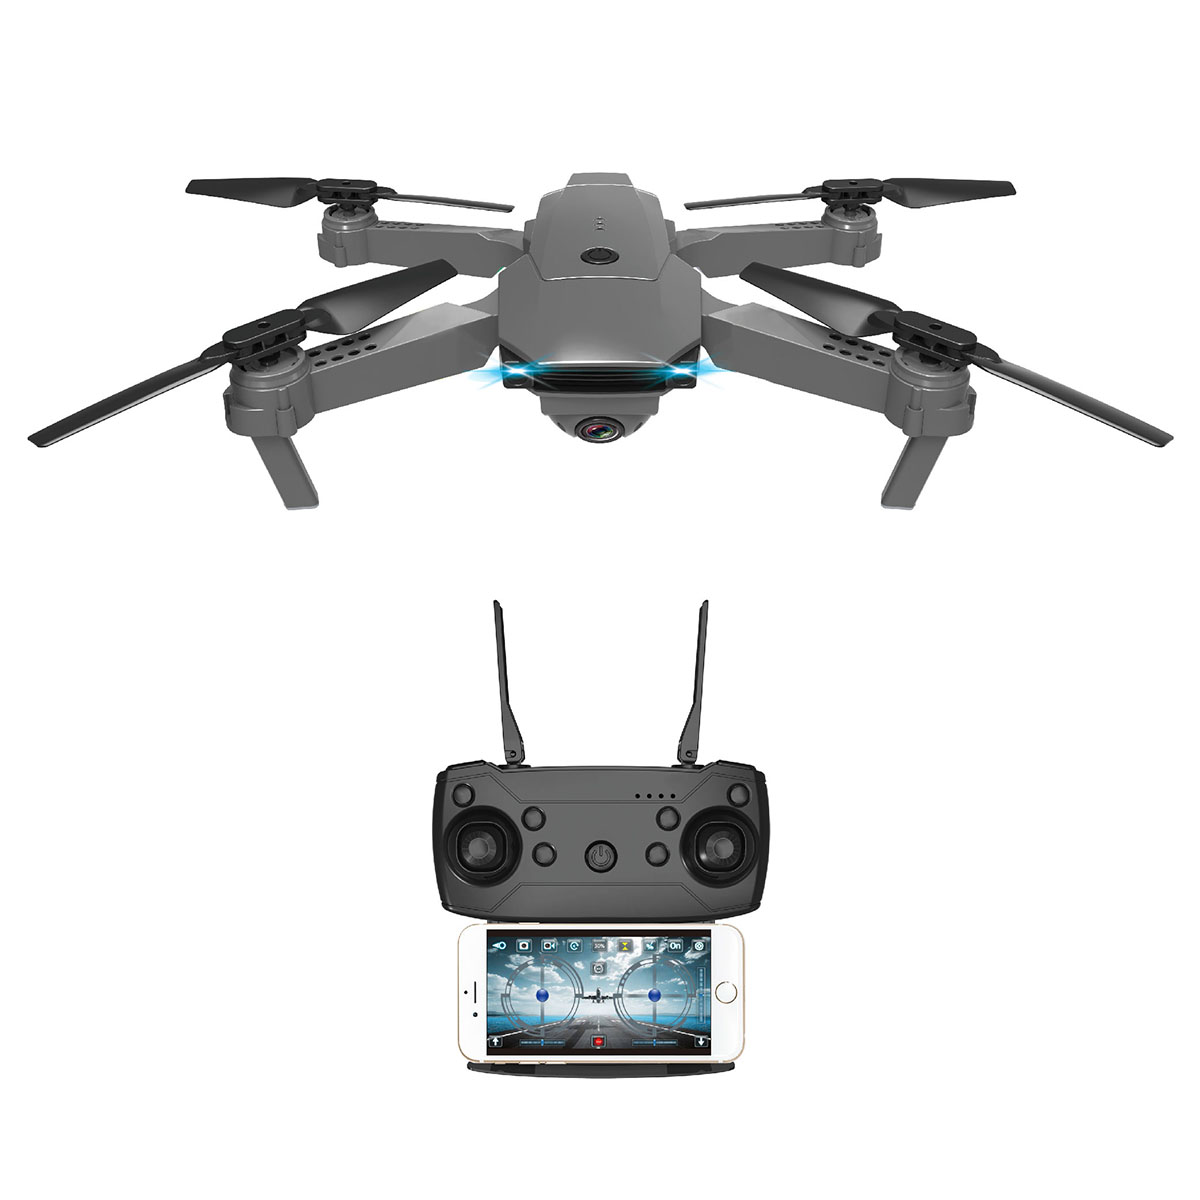 Drona pliabila cu camera HD iDrive imagine